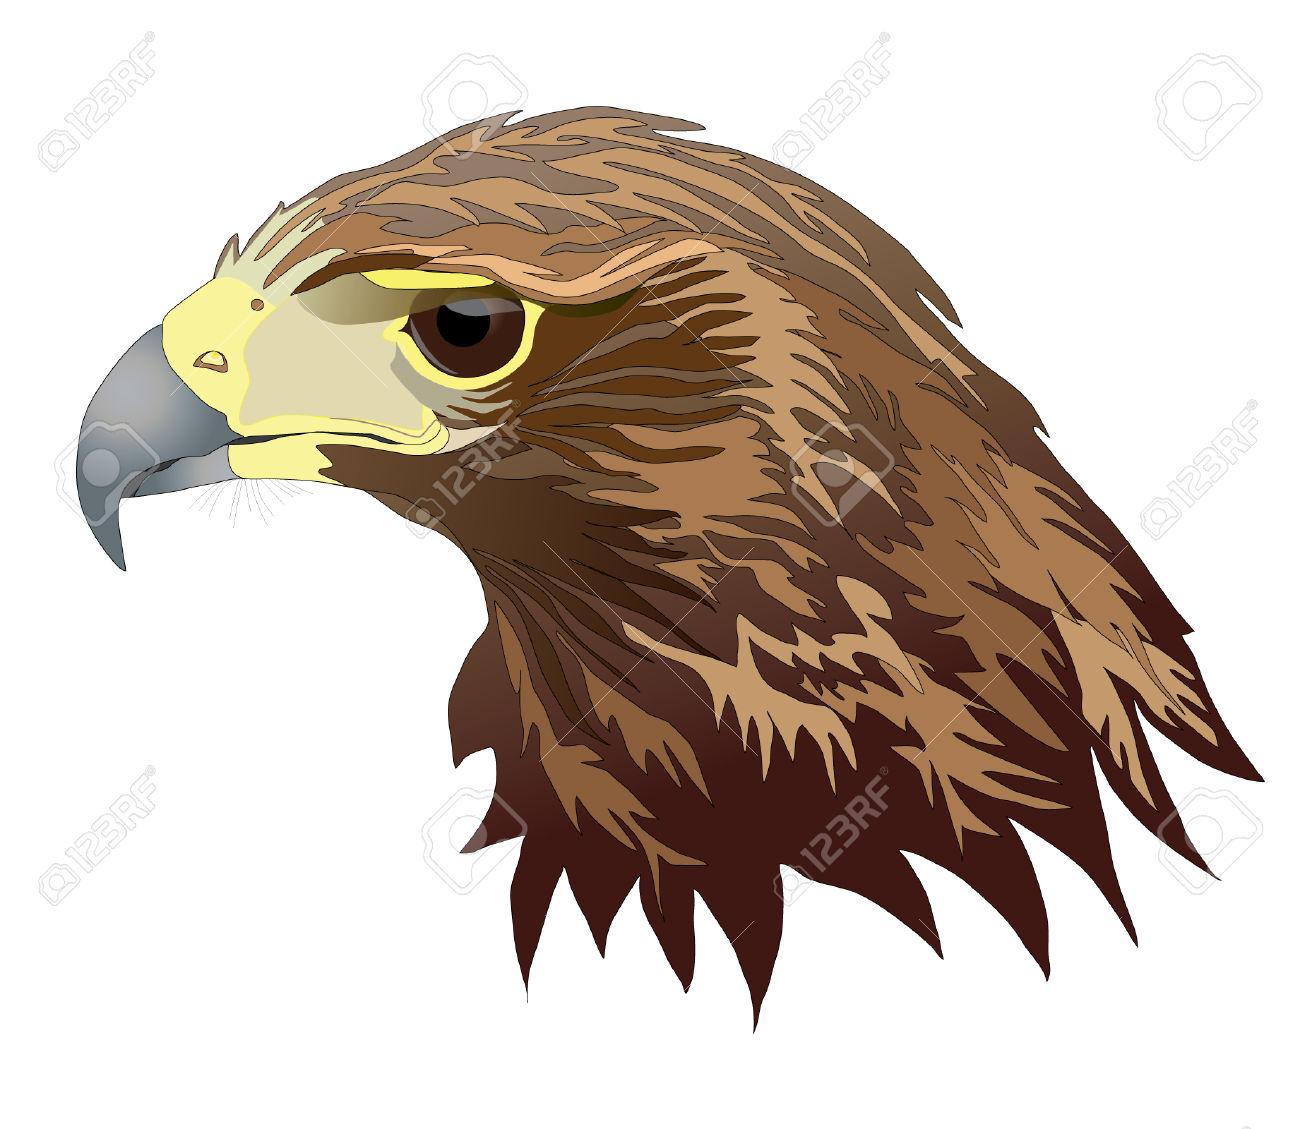 Harris Hawk clipart #18, Download drawings